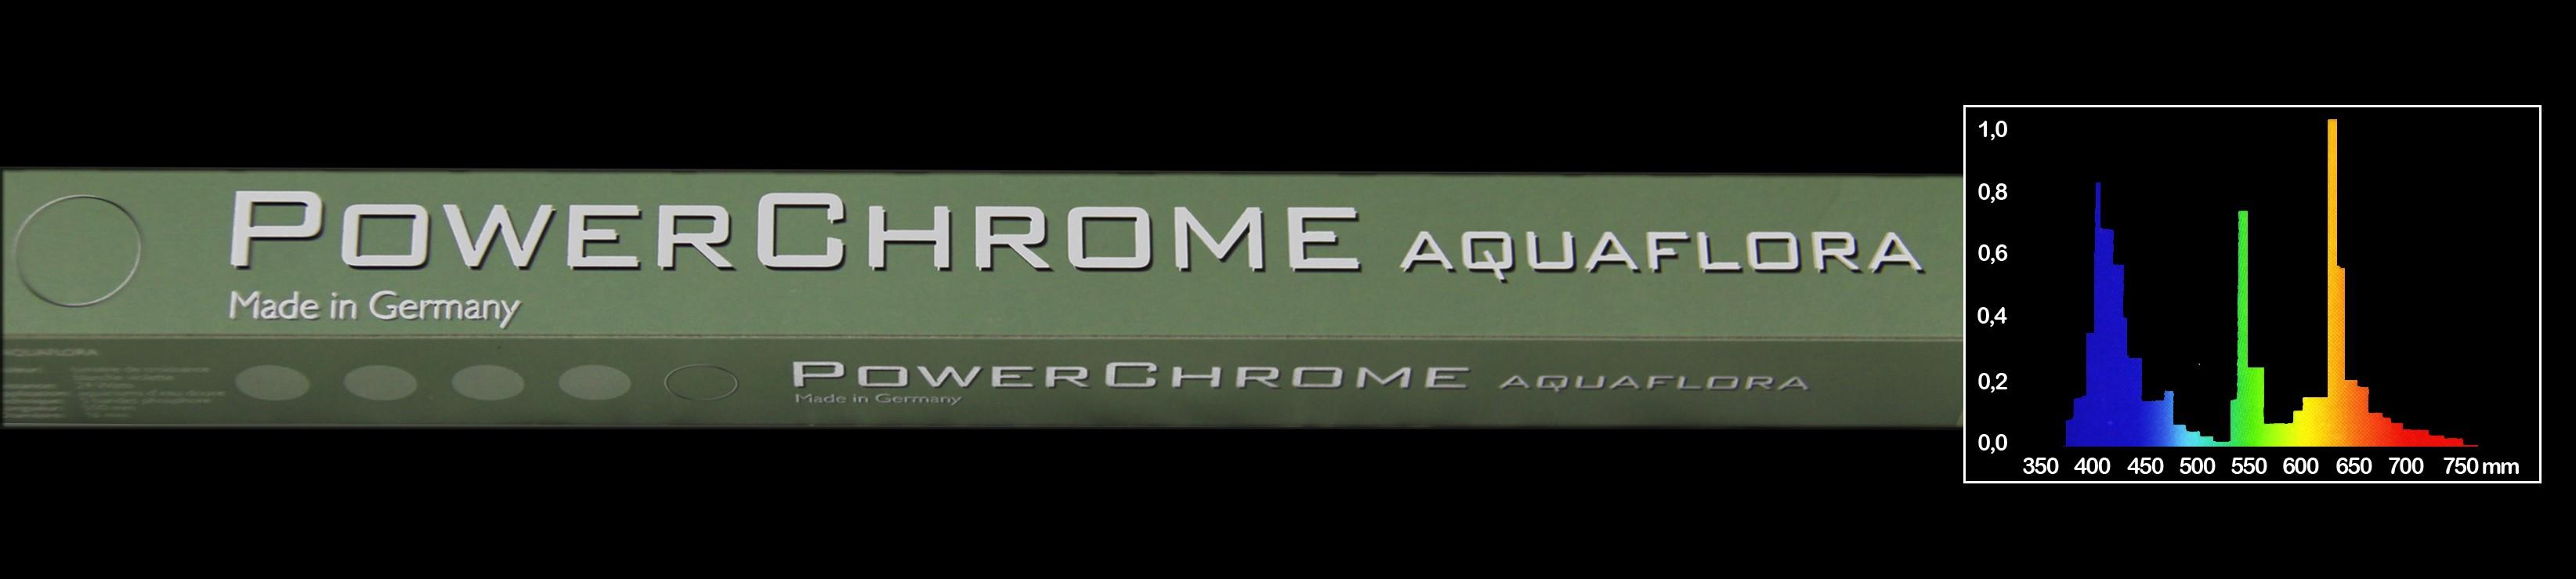 POWERCHROME T5 AQUAFLORA